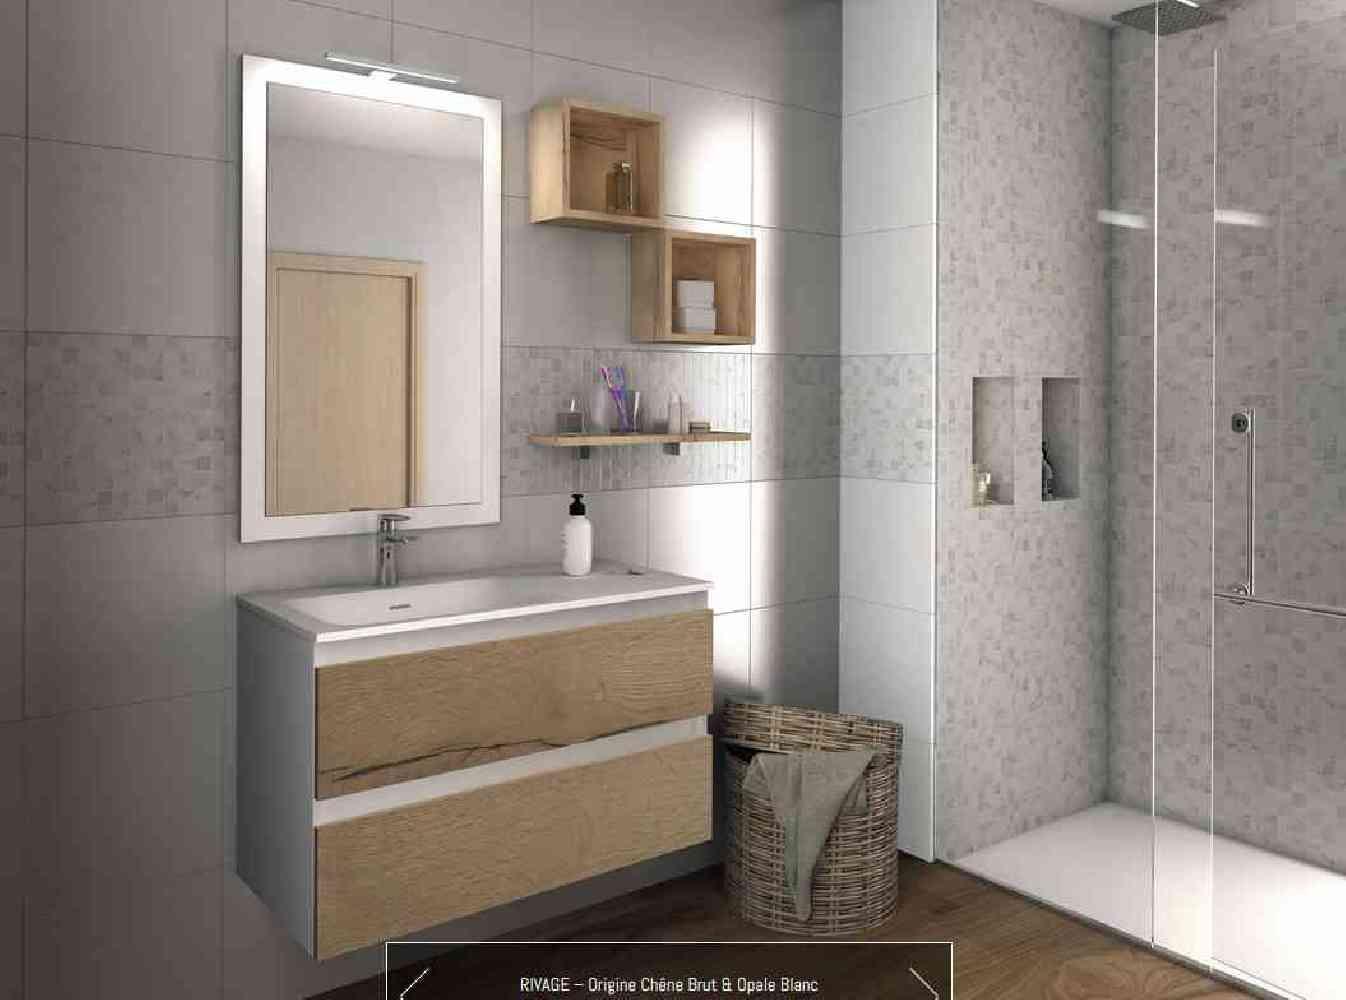 Meuble de salle de bain Rivage concepts 20 vasque à gauche Discac